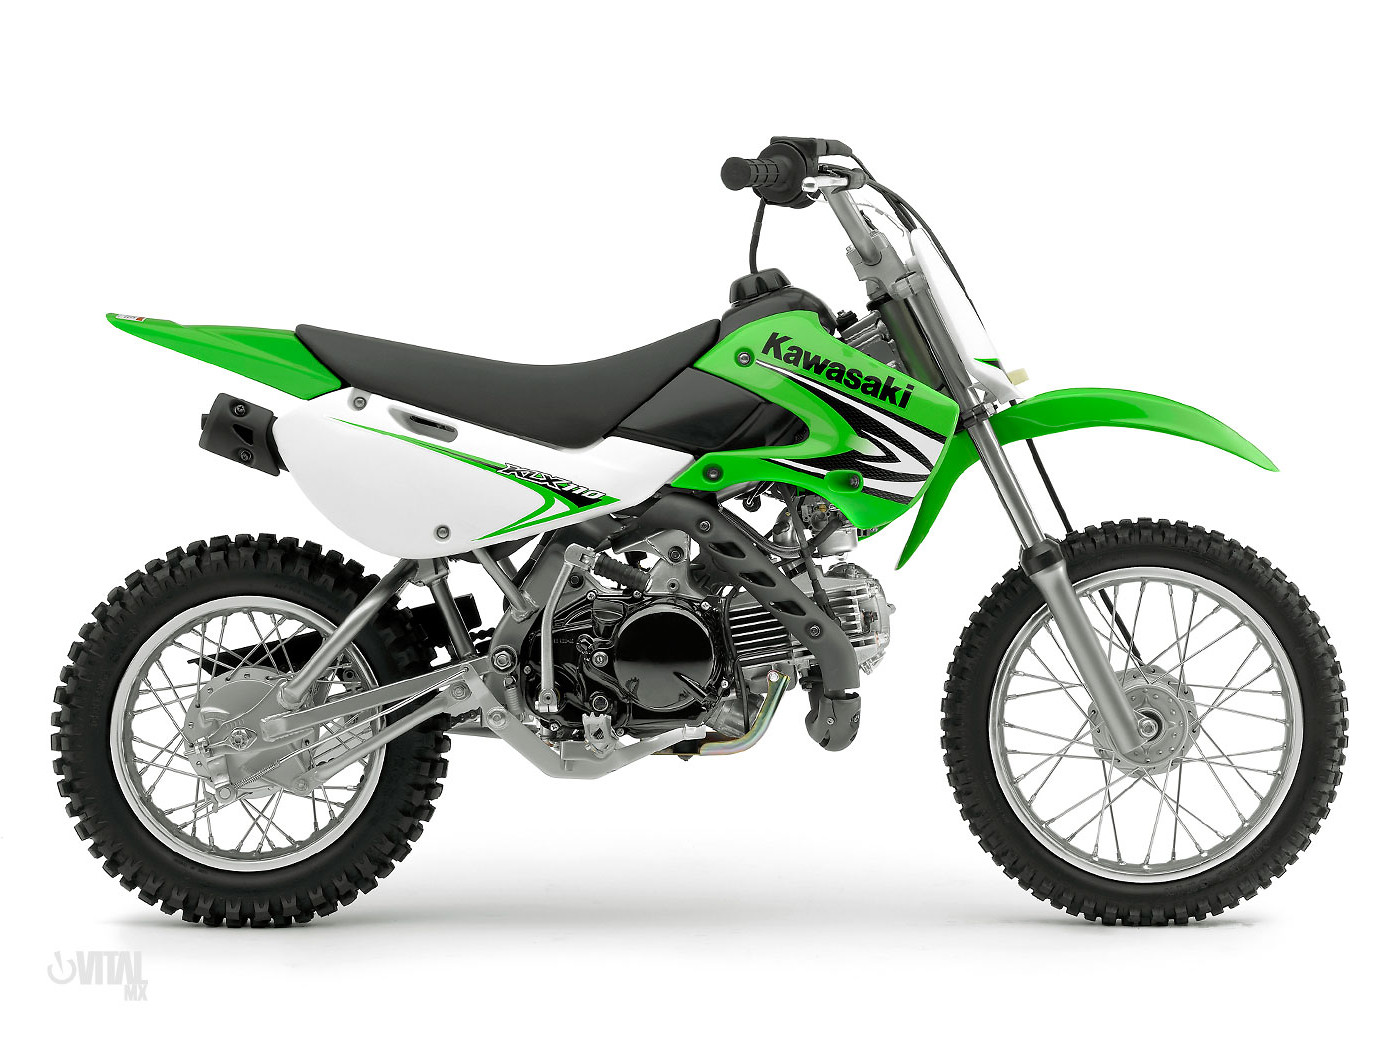 2008 Kawasaki Klx110 Reviews Comparisons Specs Motocross Dirt Bike Bikes Vital Mx